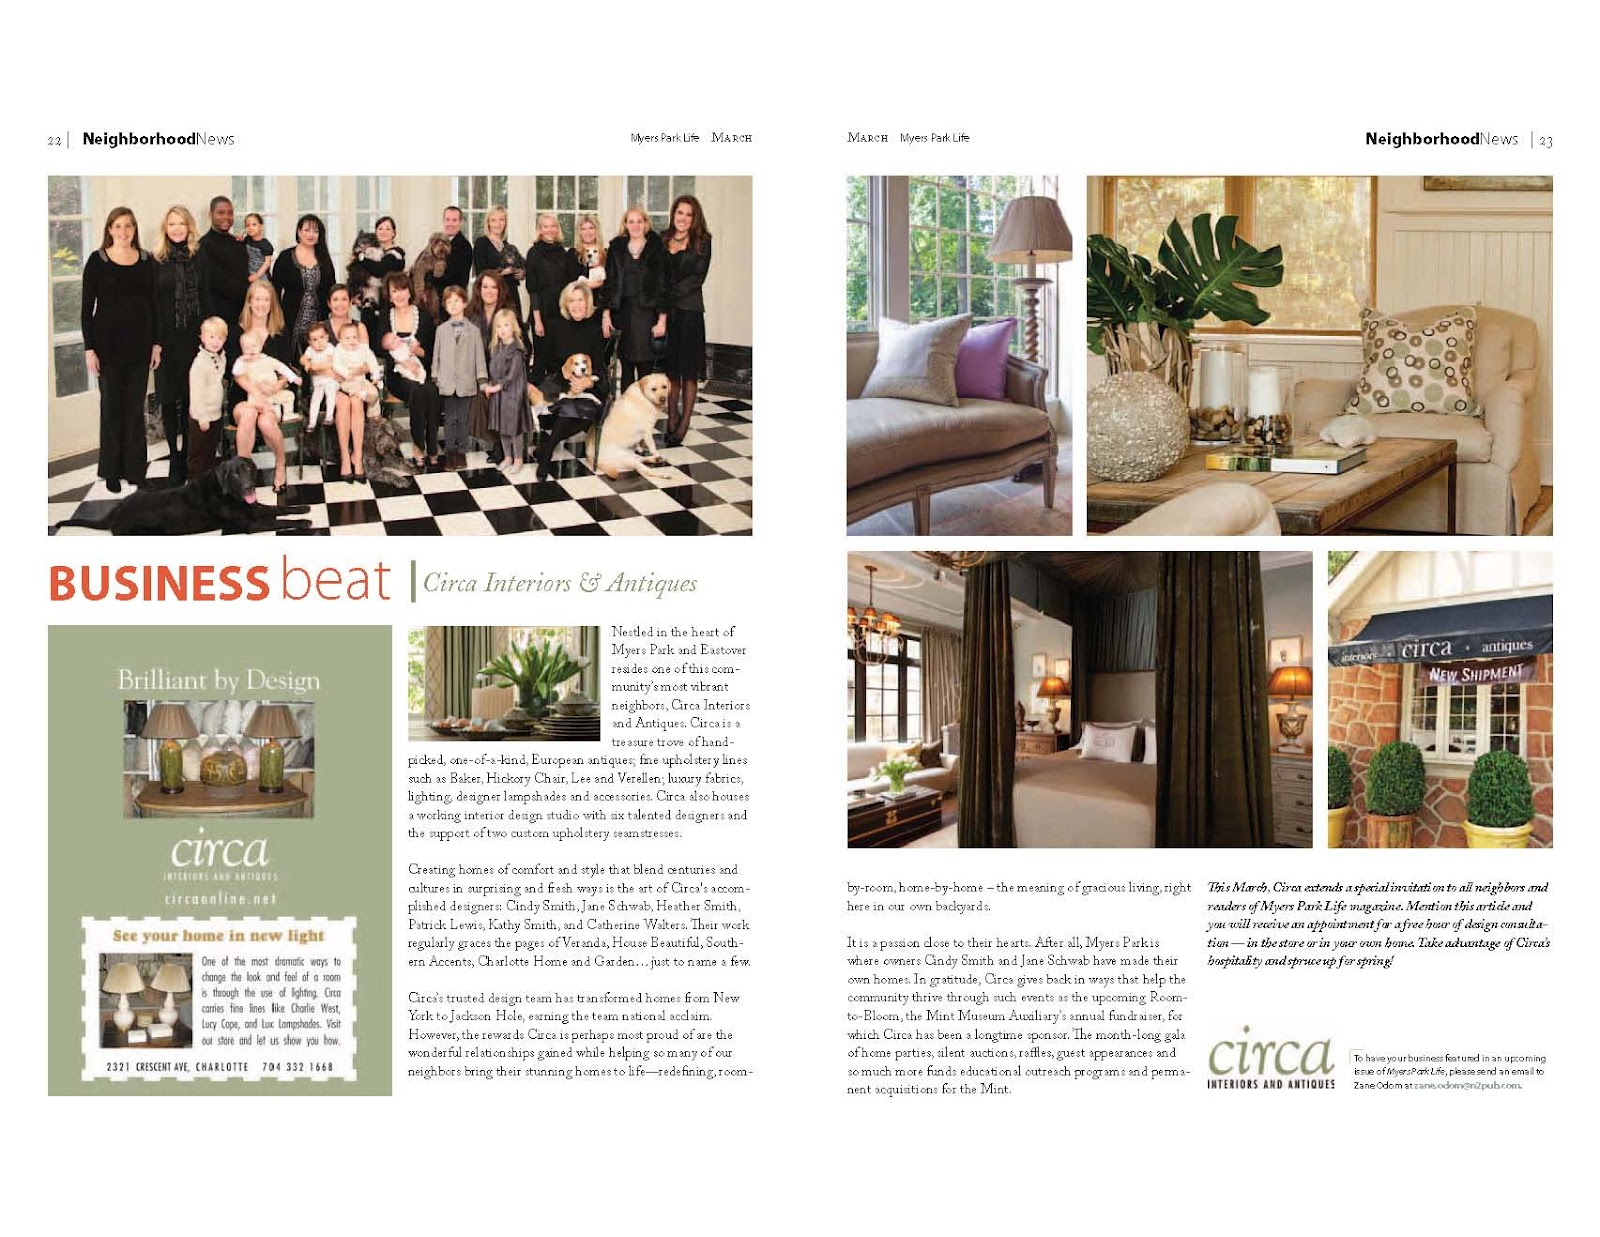 Circa: Circa Featured in Myers Park Magazine